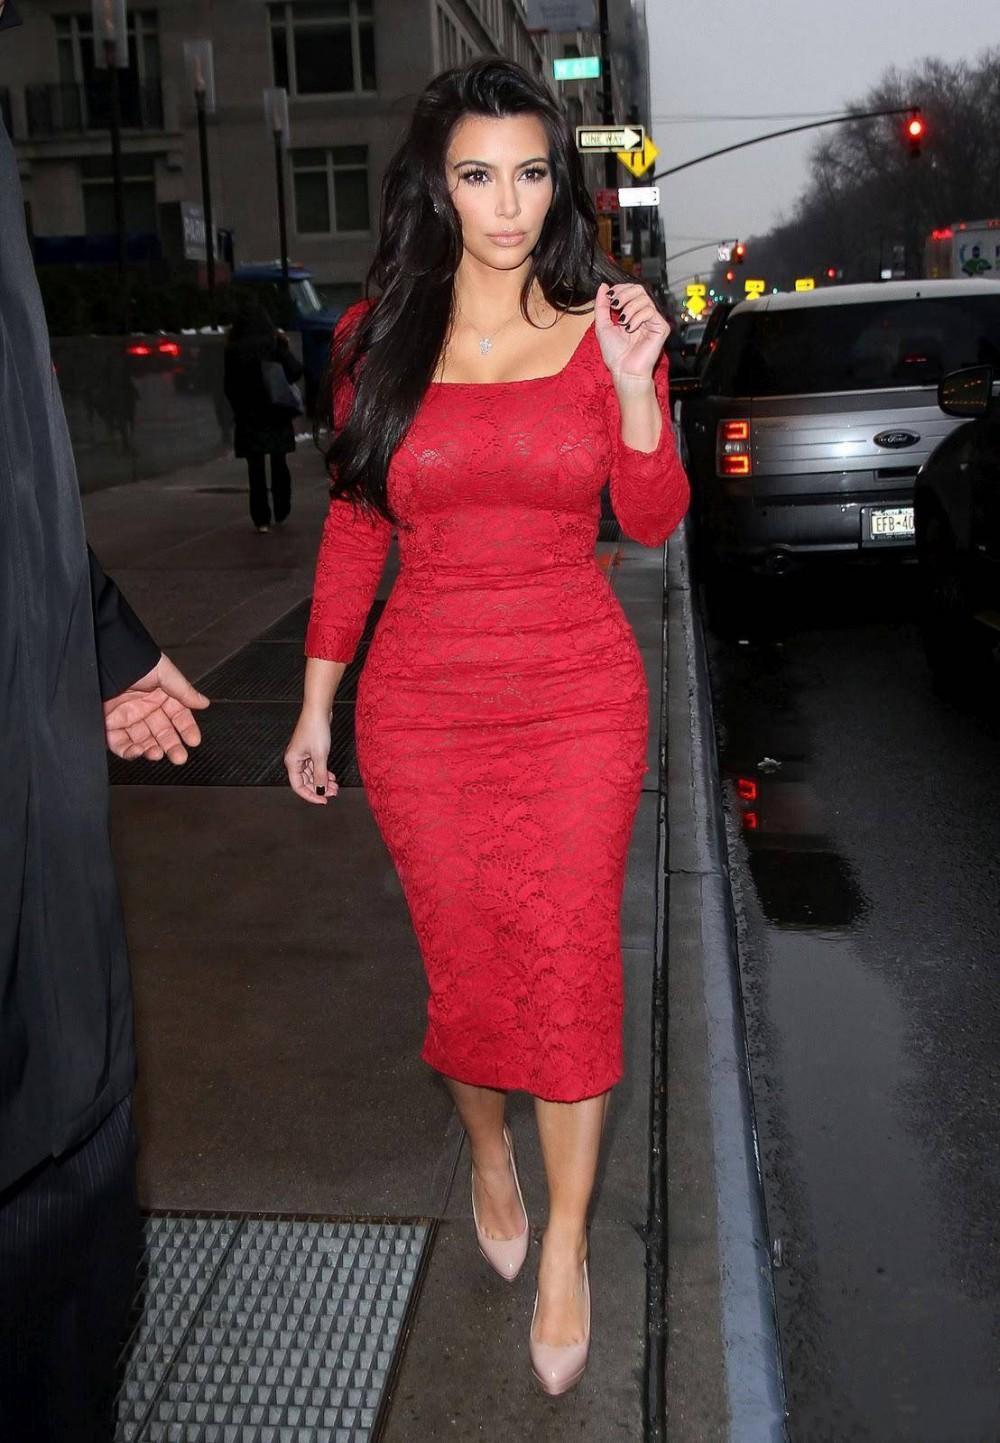 2019 New Sexy Formal Dress Vestidos Knee Length Kim Kardashian Red Carpet Dresses Long Sleeves Red Lace Celebrity Dresses Evening Dress Elegant Formal